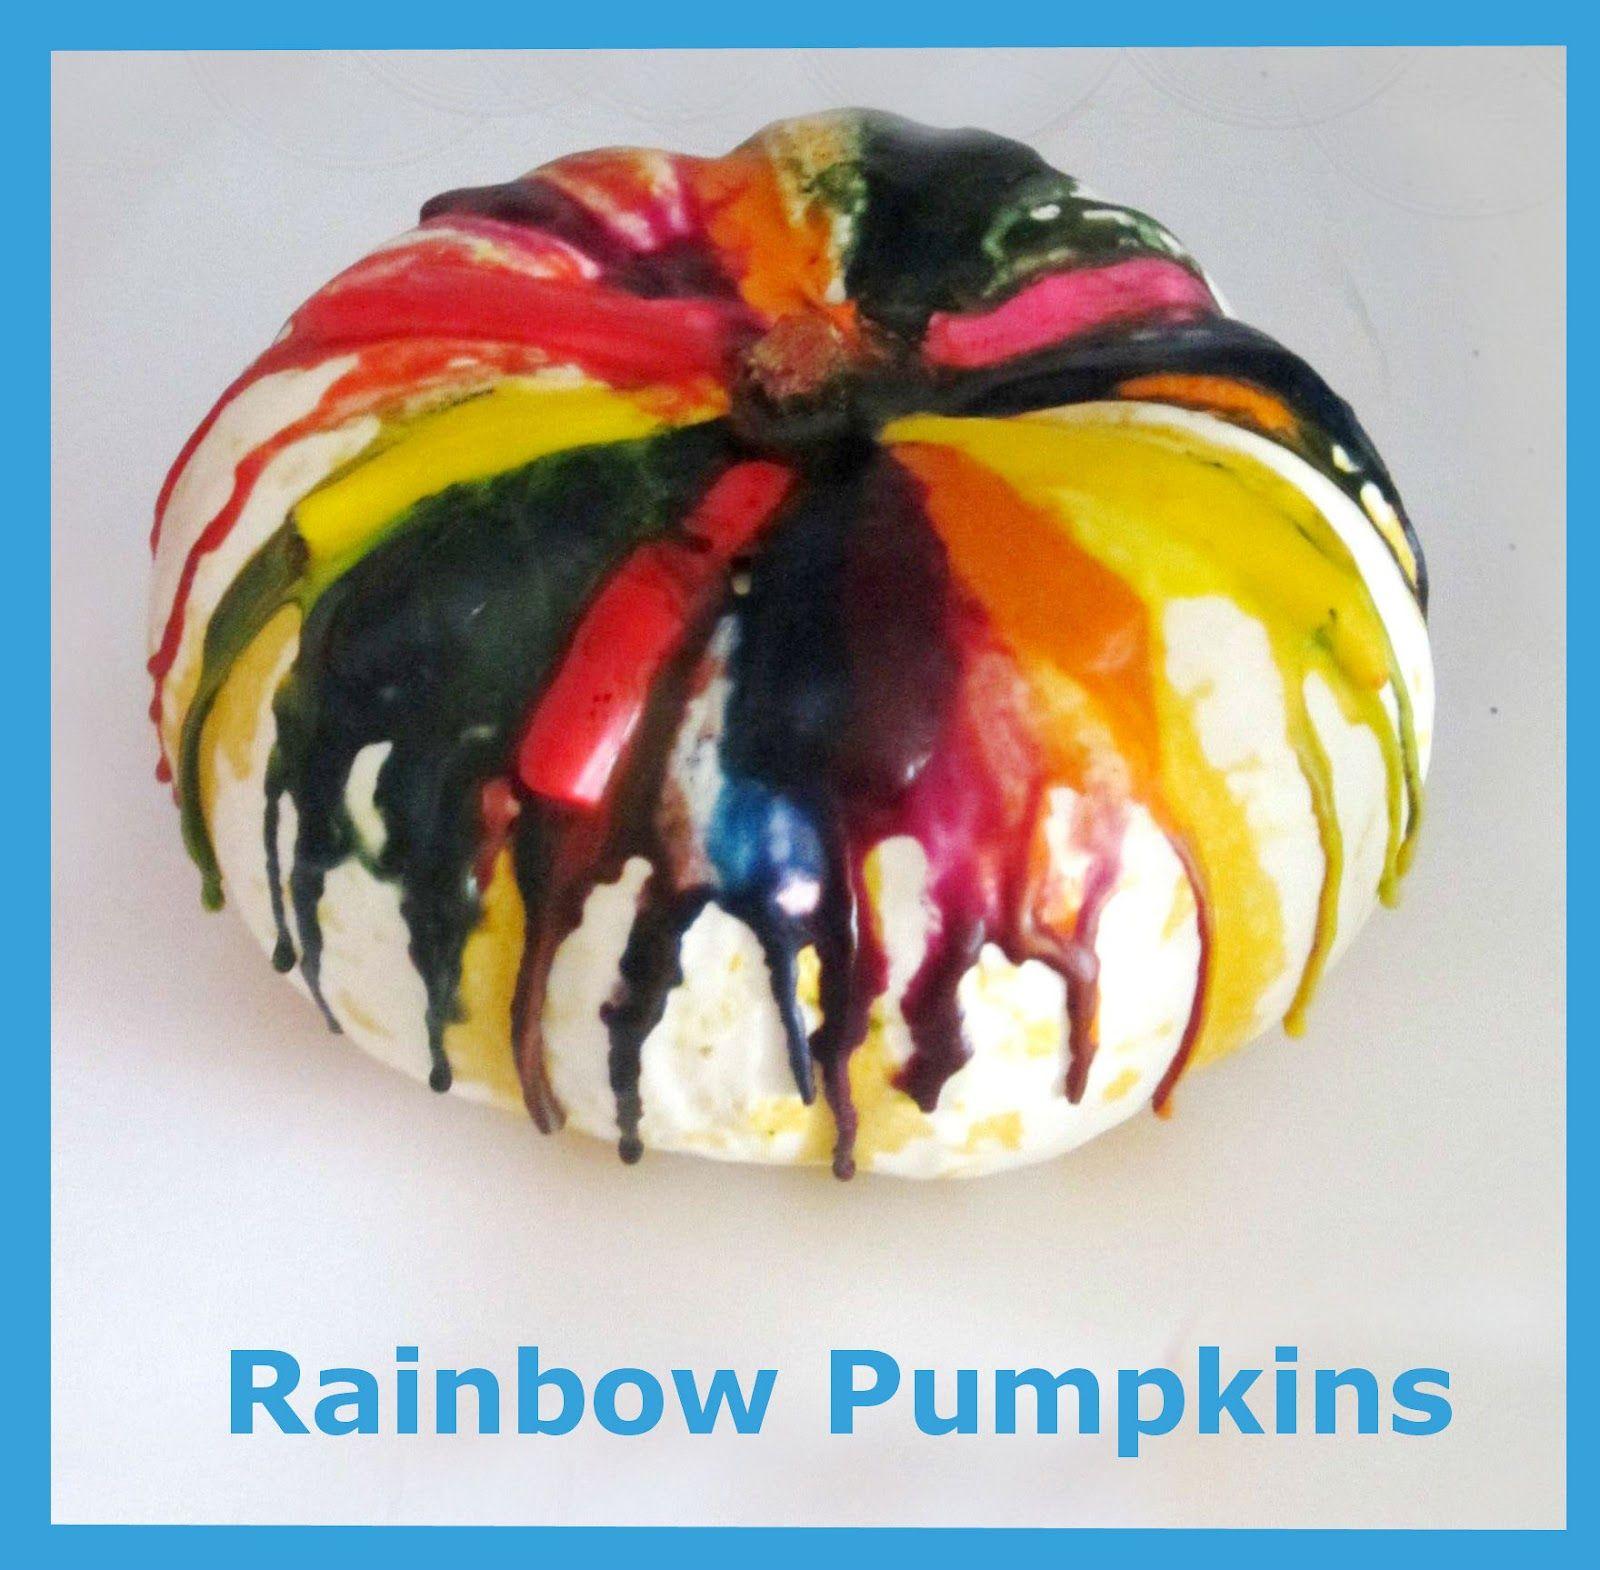 Rainbow Pumpkin Tutorial